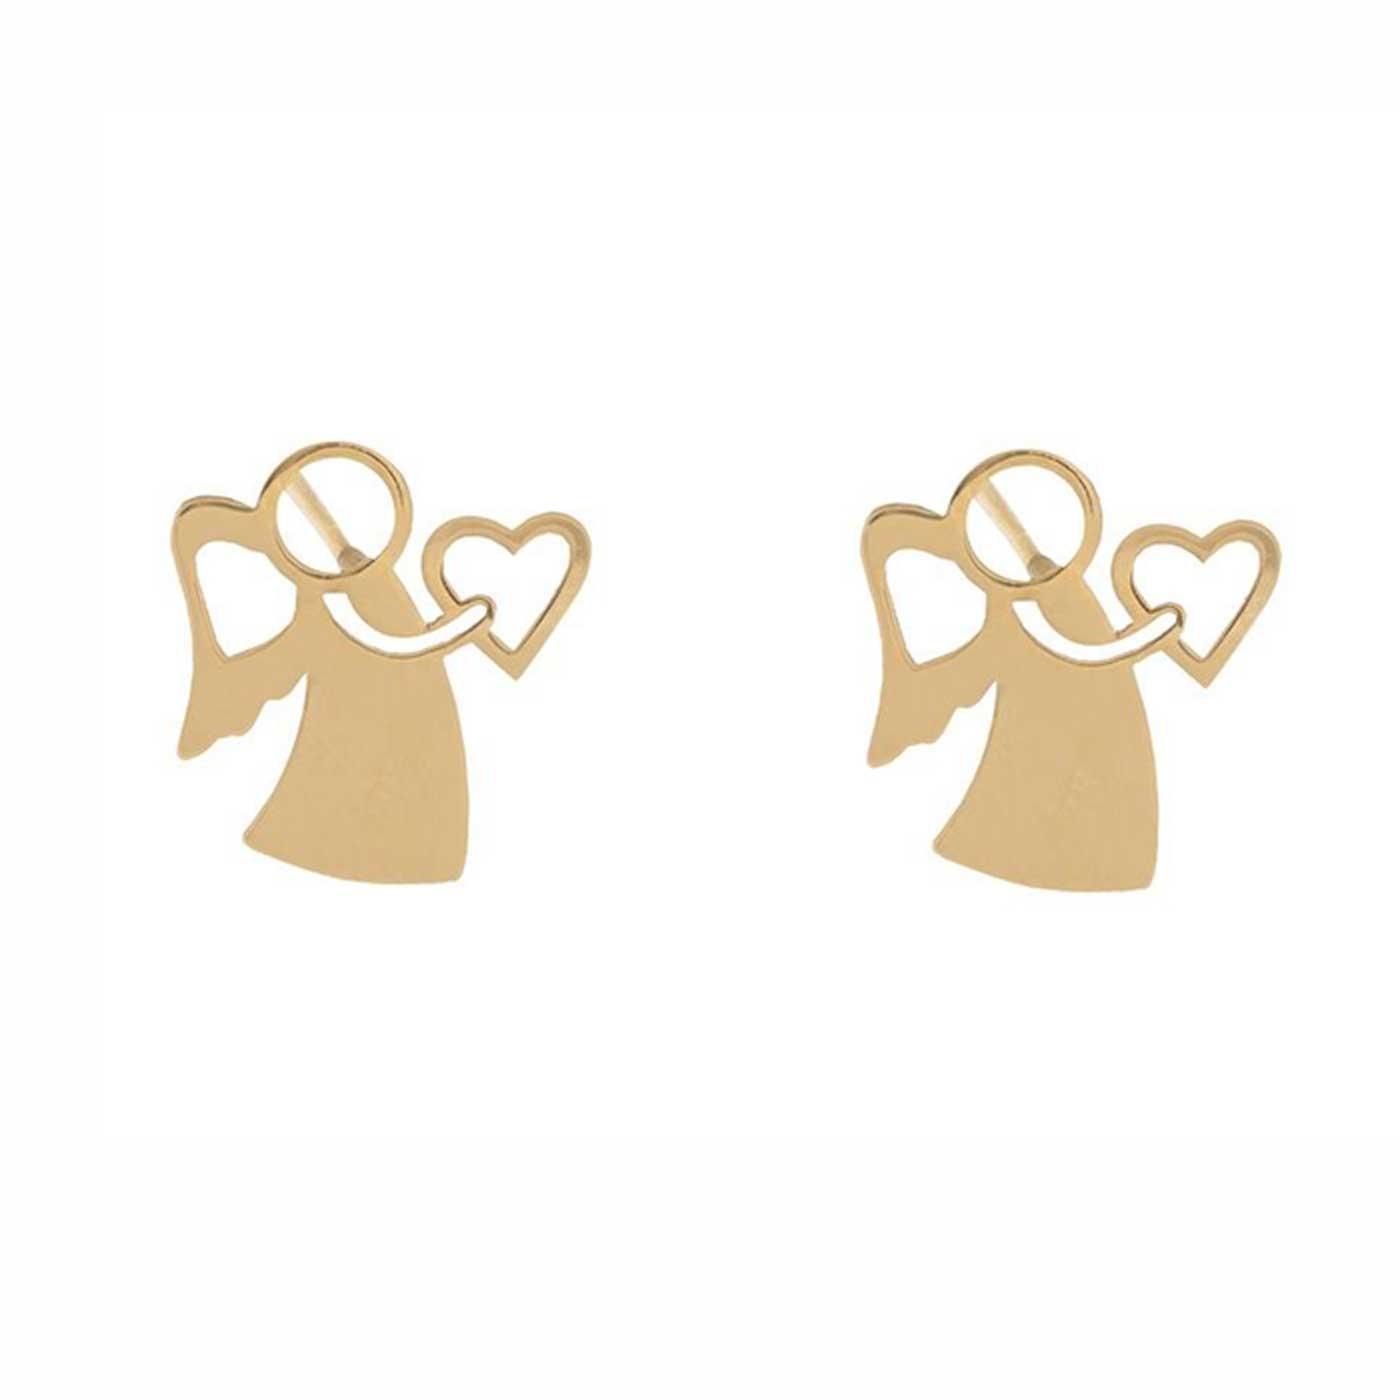 گوشواره طلا 18 عیار زنانه کانیار گالری کد GOA105 -  - 3